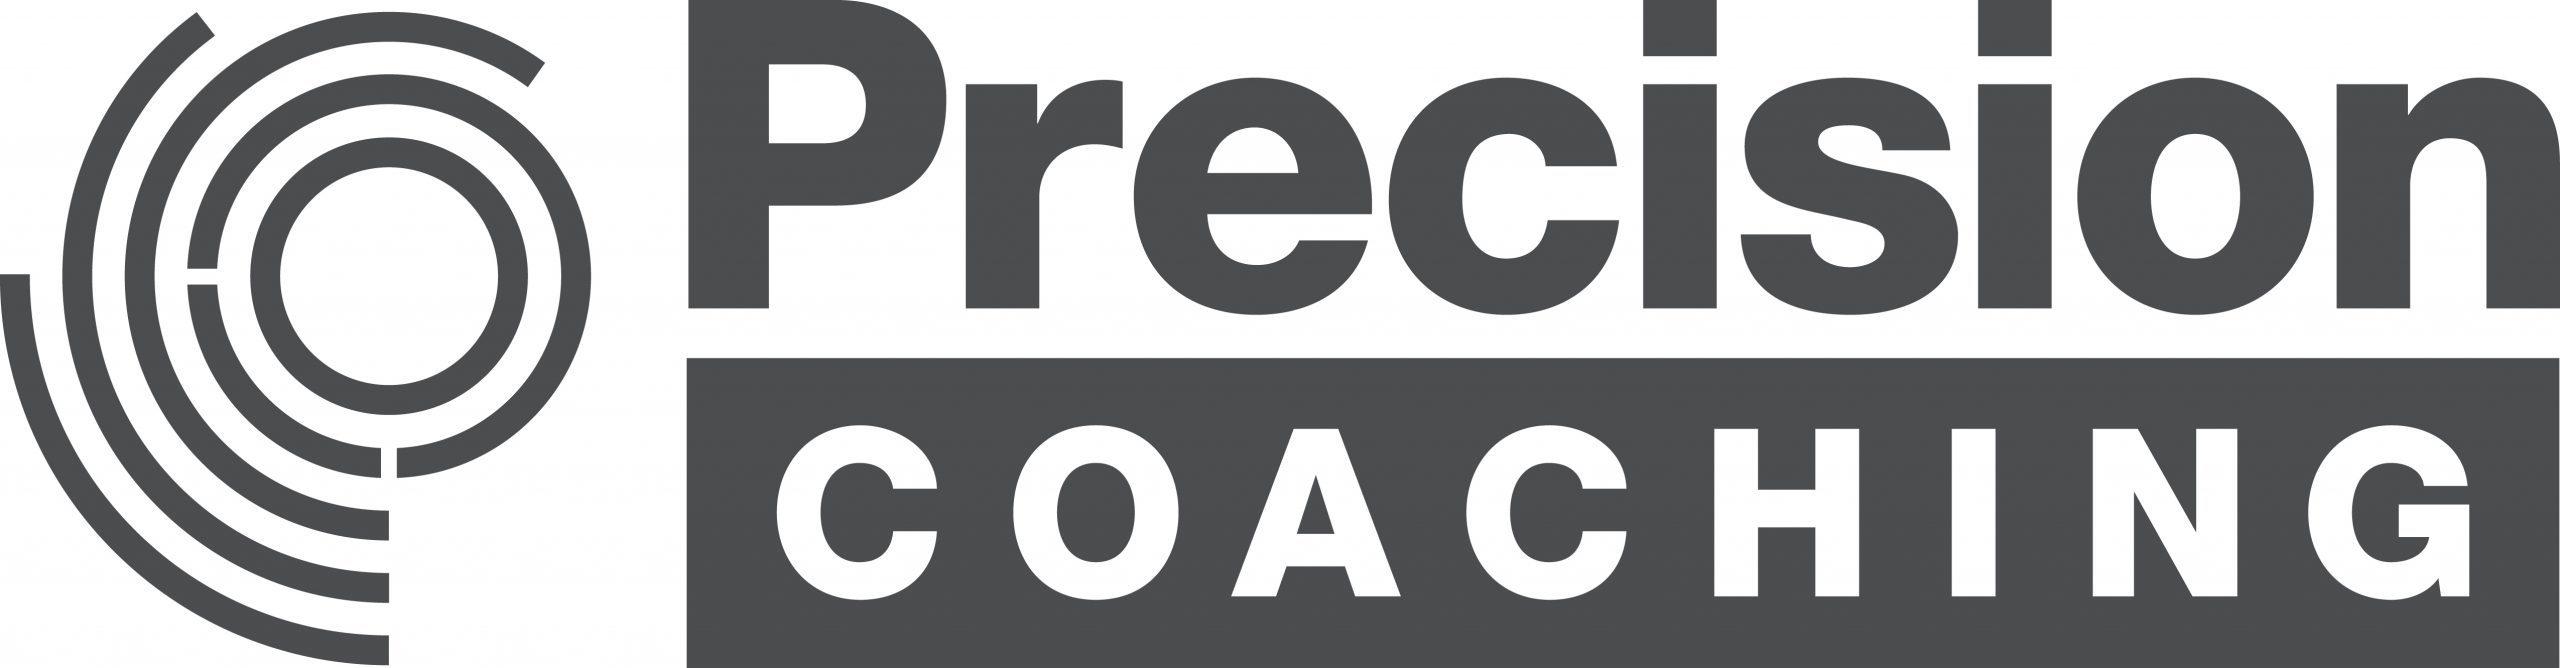 Precision Coaching